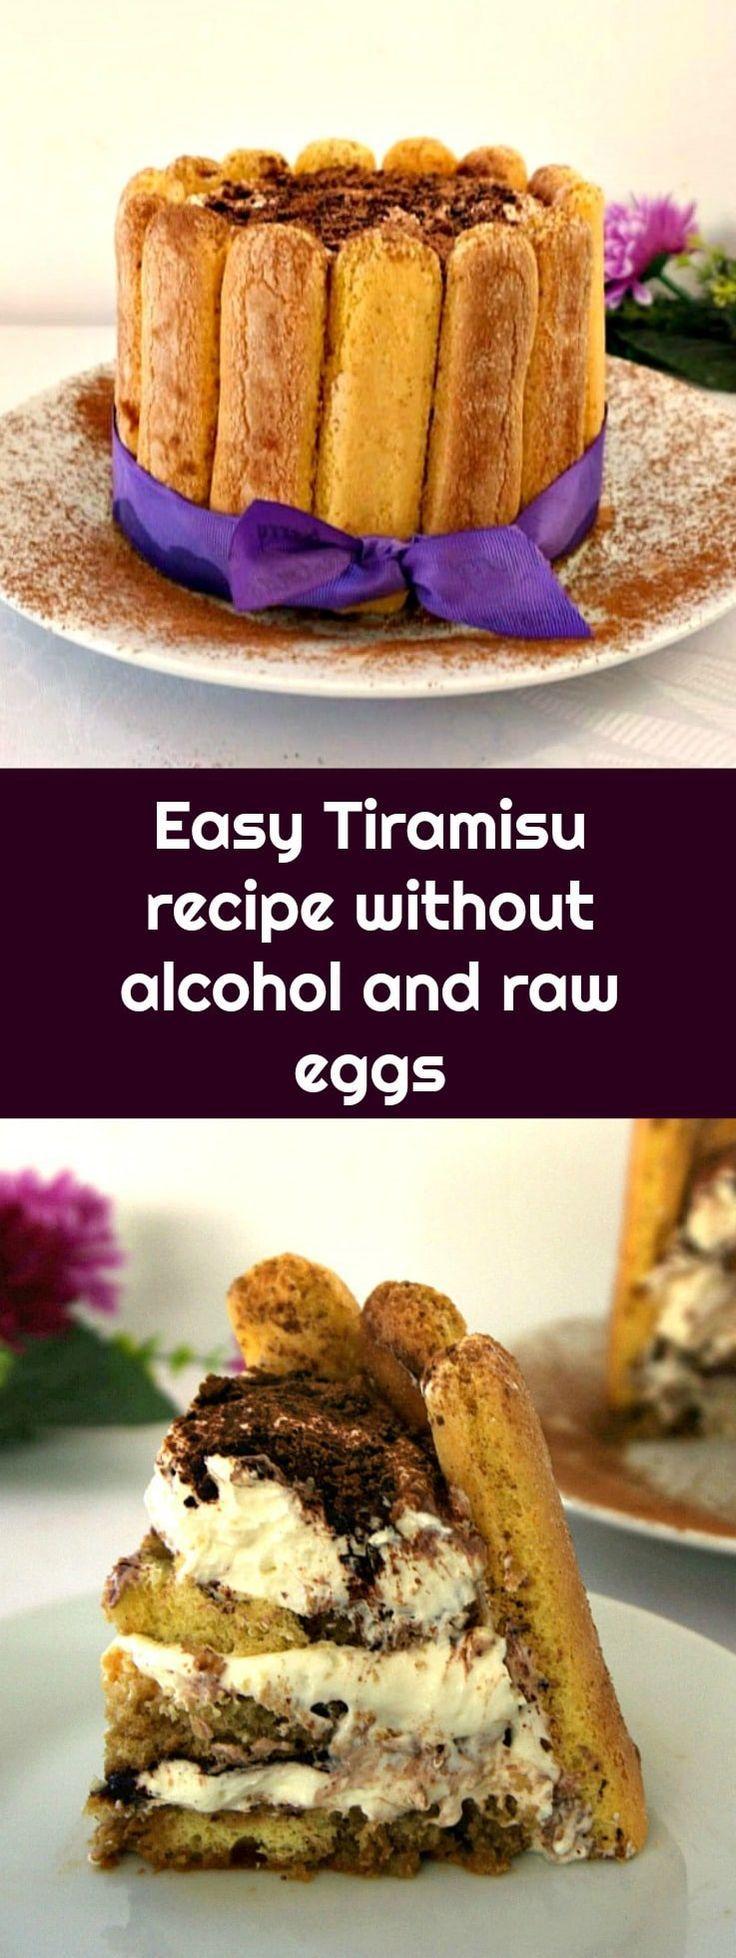 Easy Tiramisu recipe without alcohol and raw eggs, my take on the famous Italian dessert, just a little less naughty. #tiramisu , #tiramisucake , #nobakedessert , #italiandessert